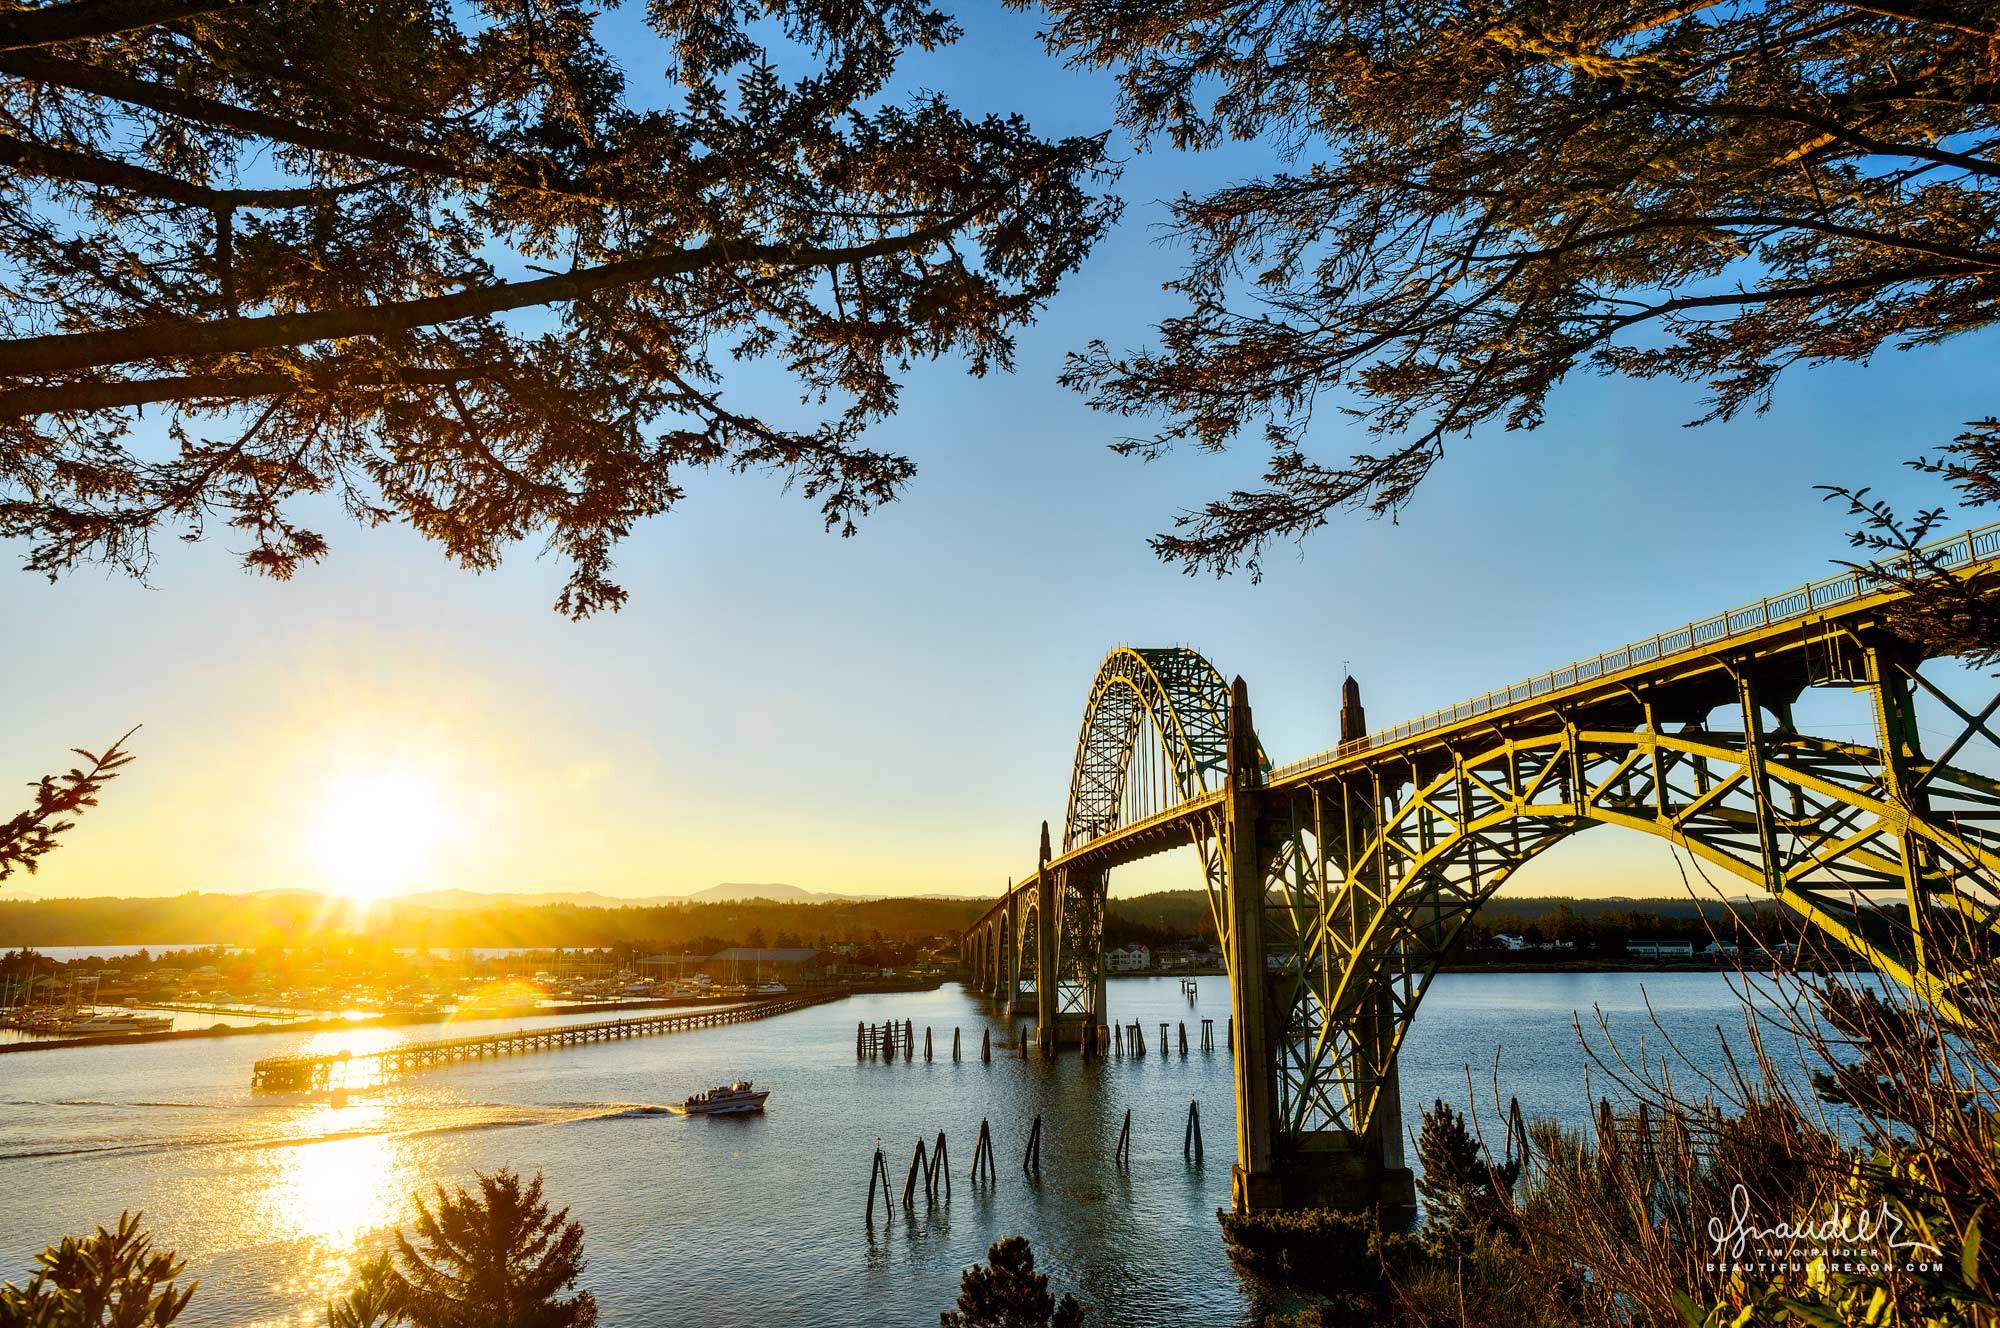 A charter boat heads to sea beneath the Yaquina Bay Bridge at sunrise. Lincoln County, Newport, Oregon Central Coast.